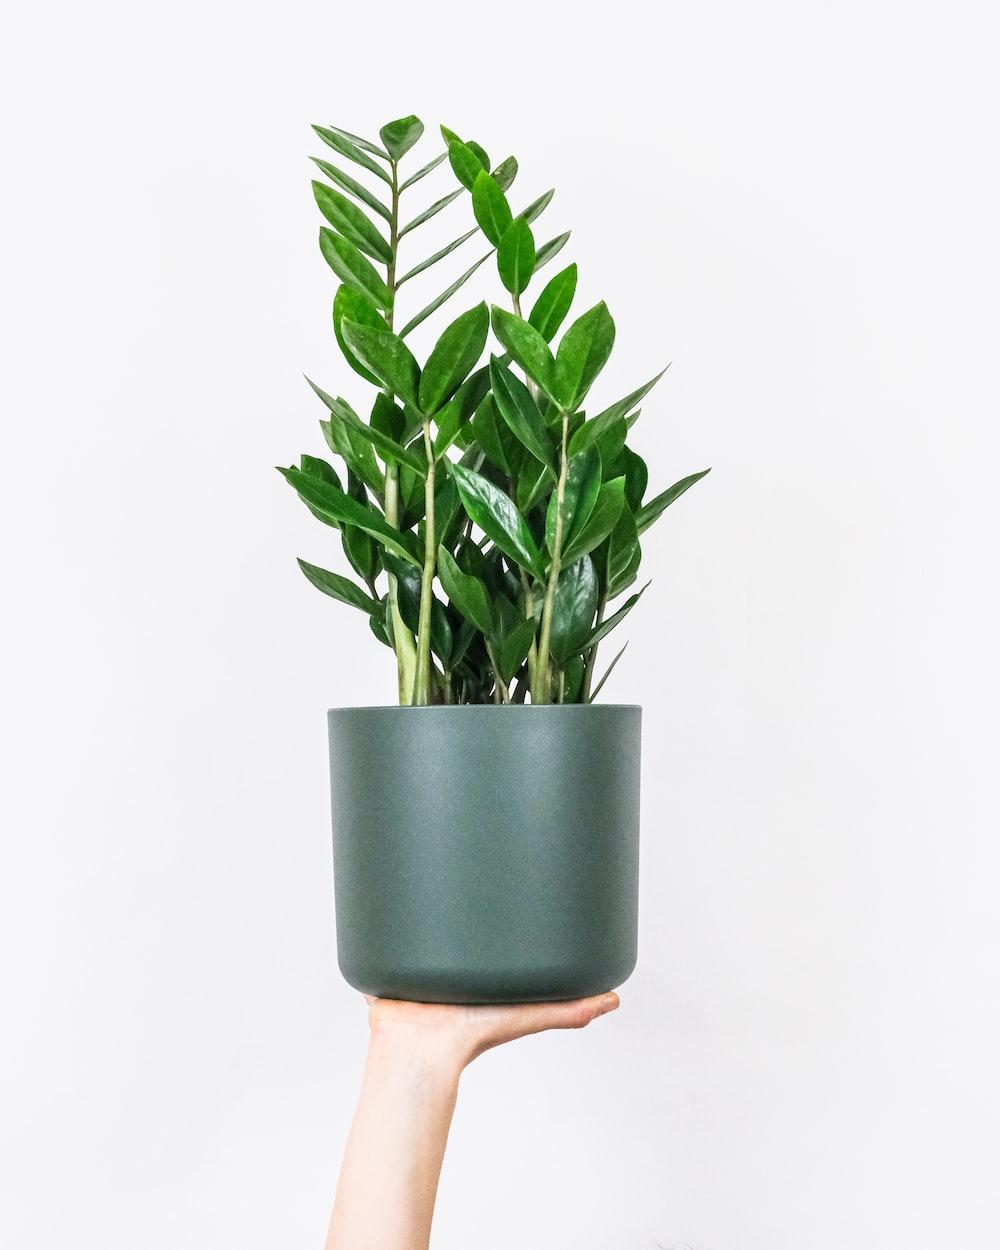 green plant on blue ceramic pot